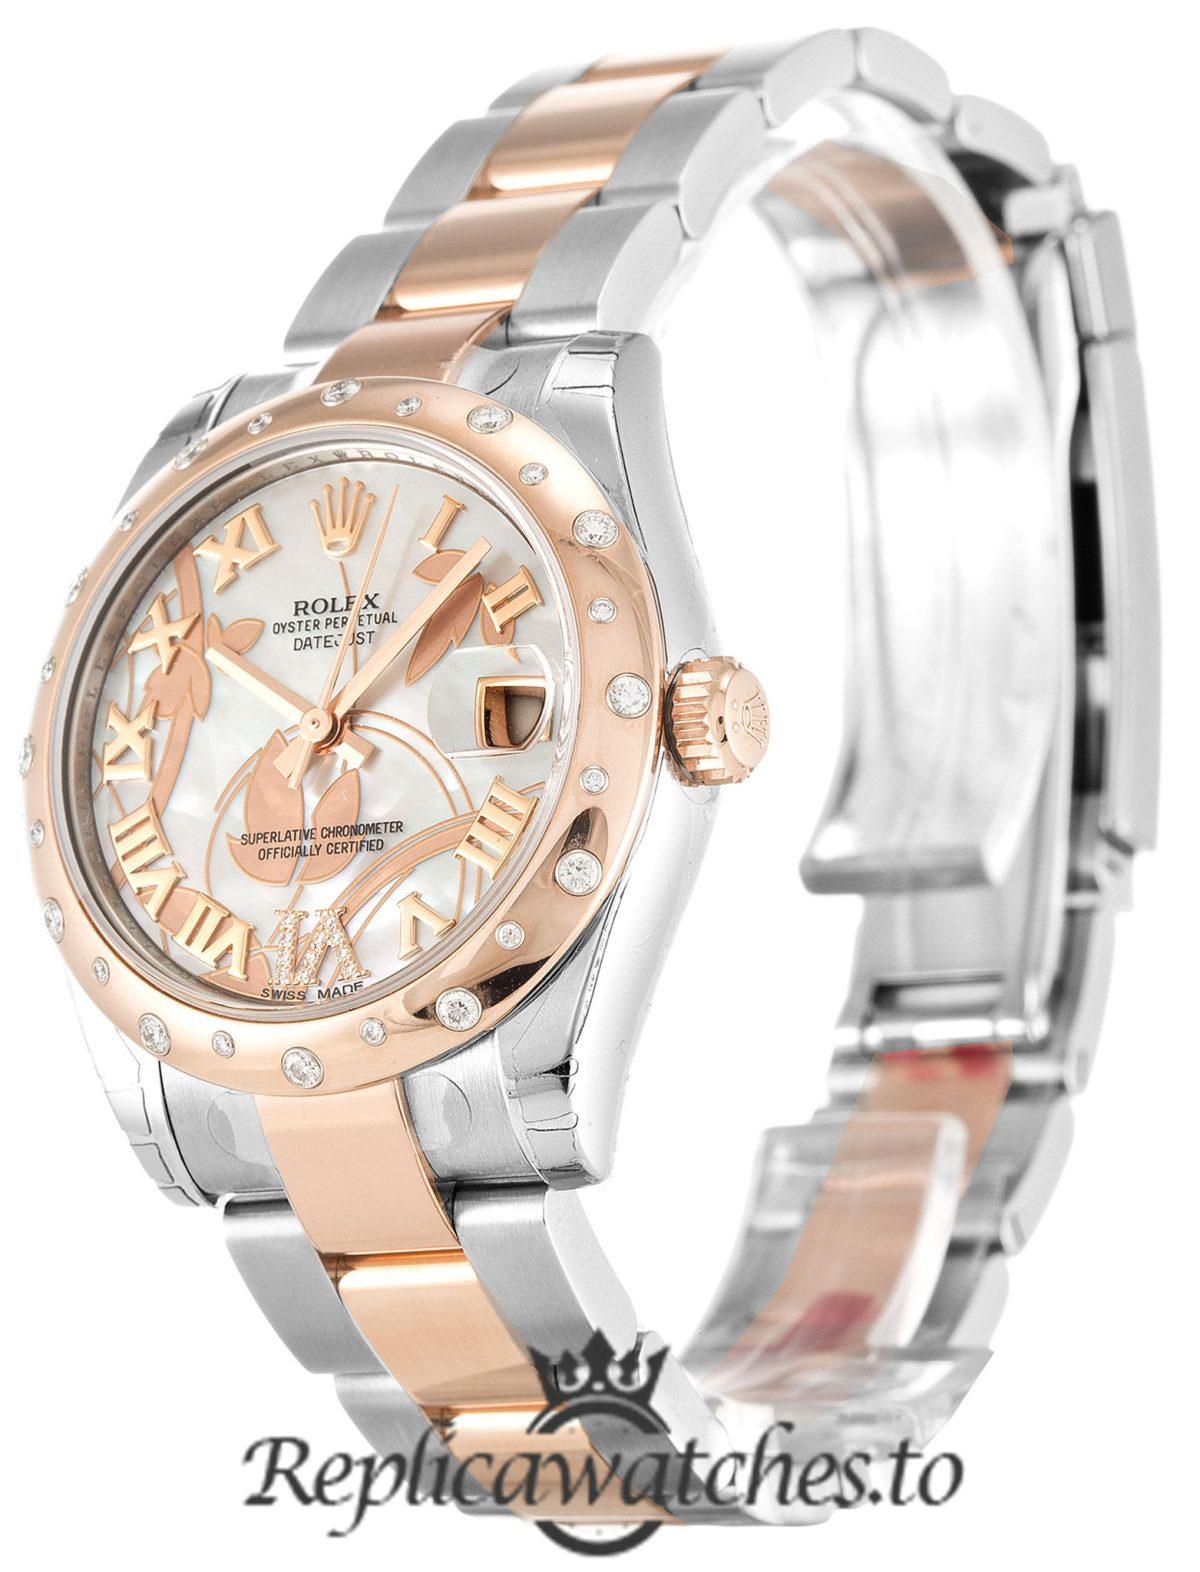 Rolex Datejust Replica 178341 001 Rose Gold Bezel 31MM